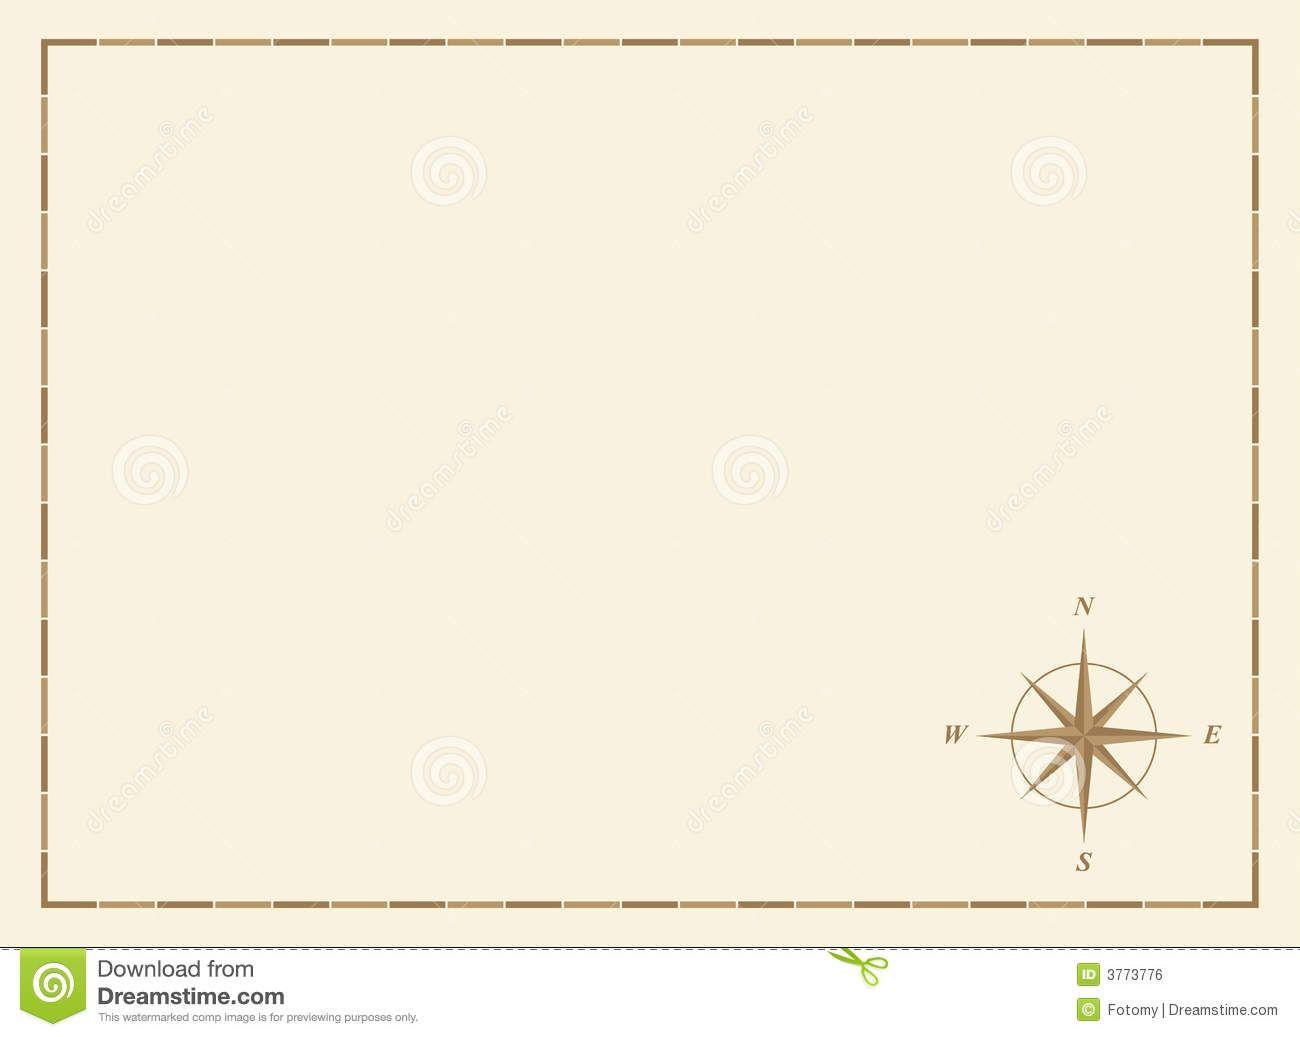 blank treasure map template - videotekaalex.tk | Kids Crafts ...